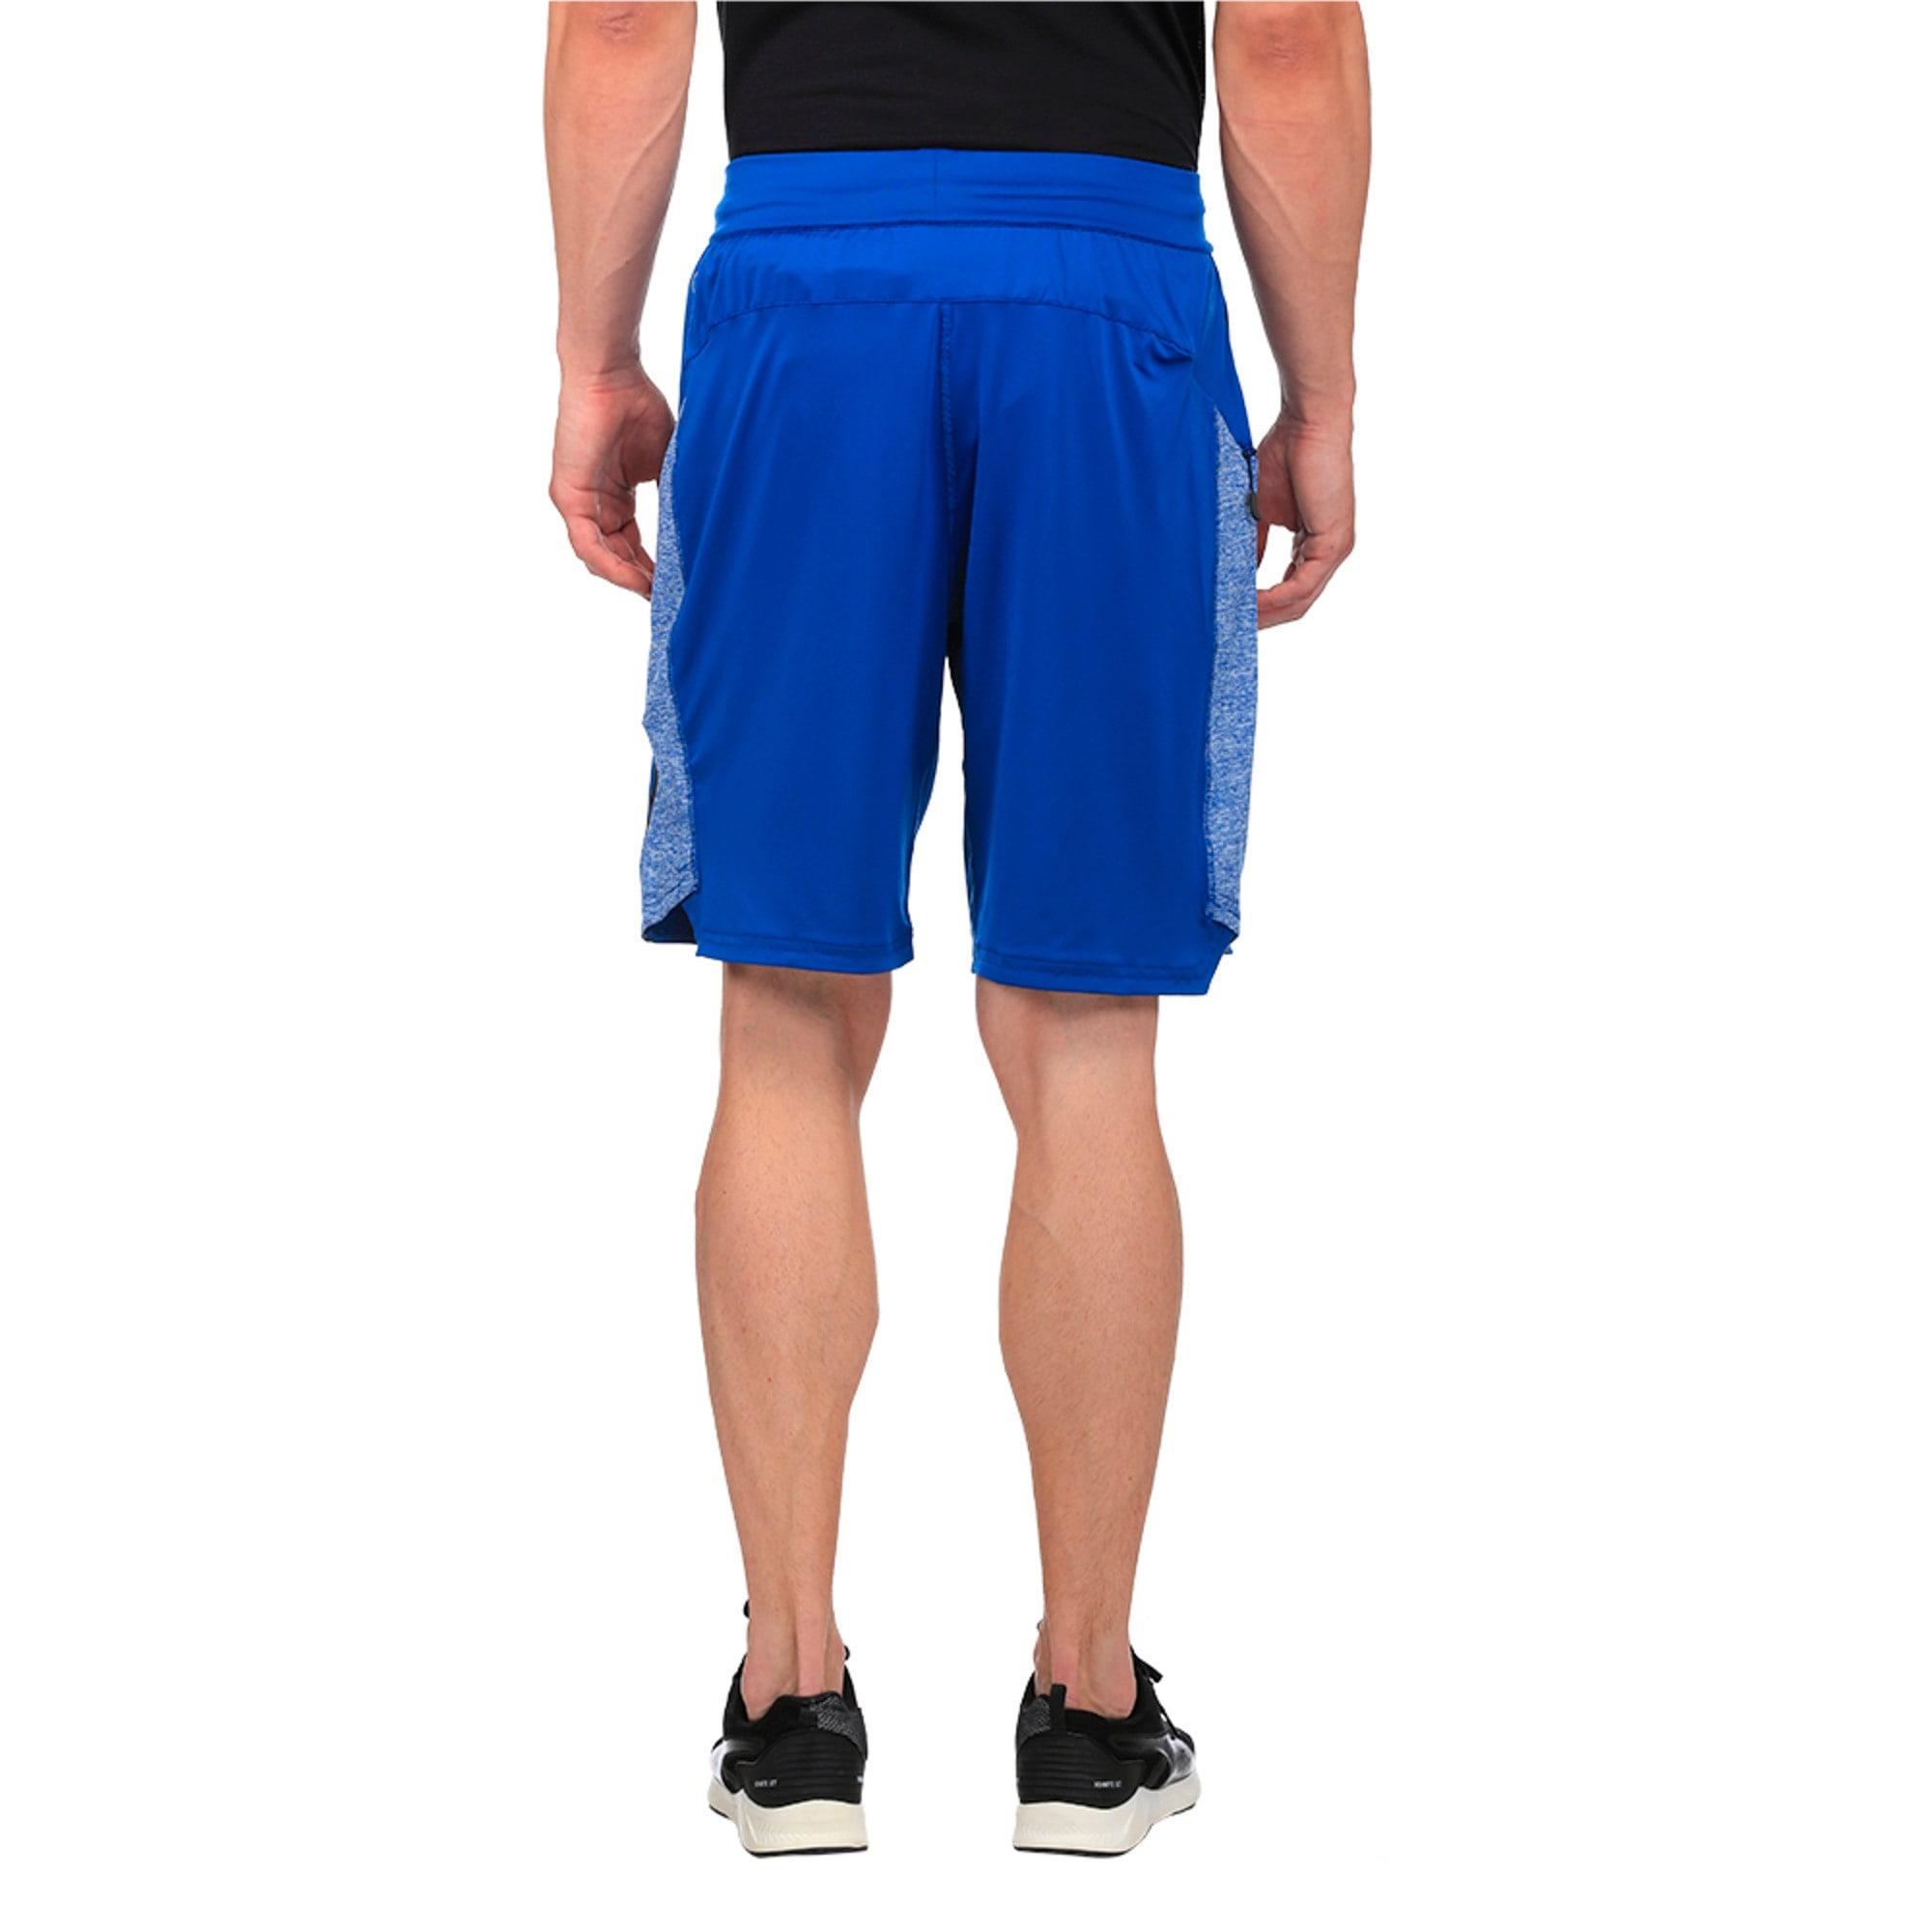 Thumbnail 2 of Active Training Men's Bonded Tech Shorts, TRUE BLUE-TRUE BLUE Heather, medium-IND